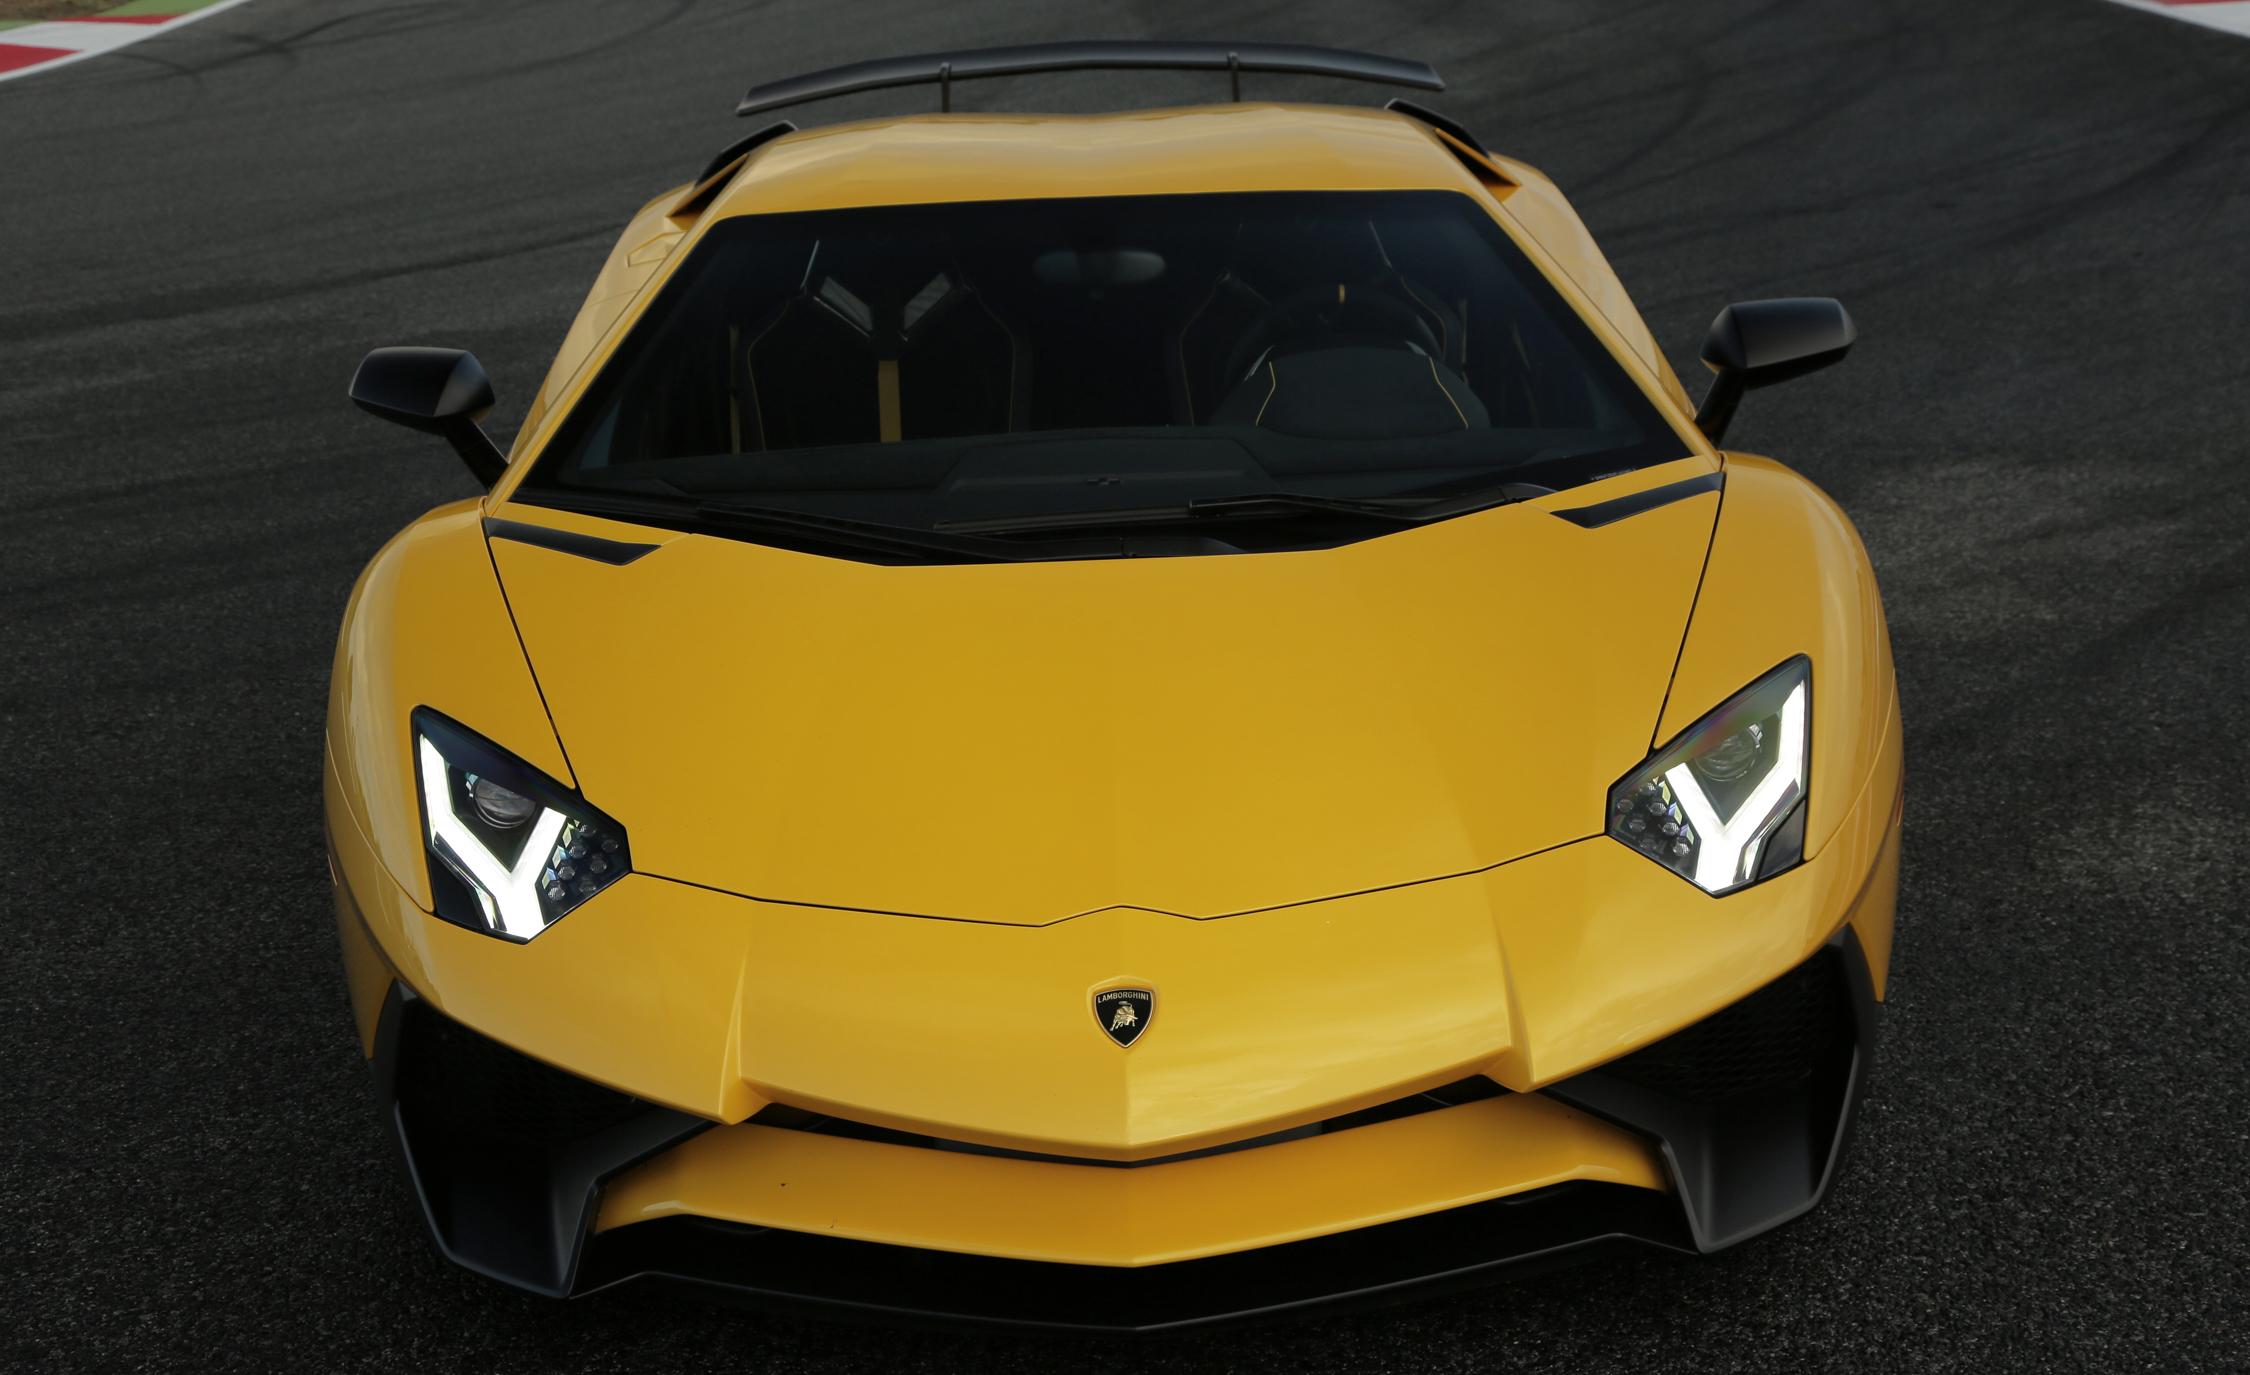 2016 Lamborghini Aventador LP750 4 SV (Photo 5 of 48)